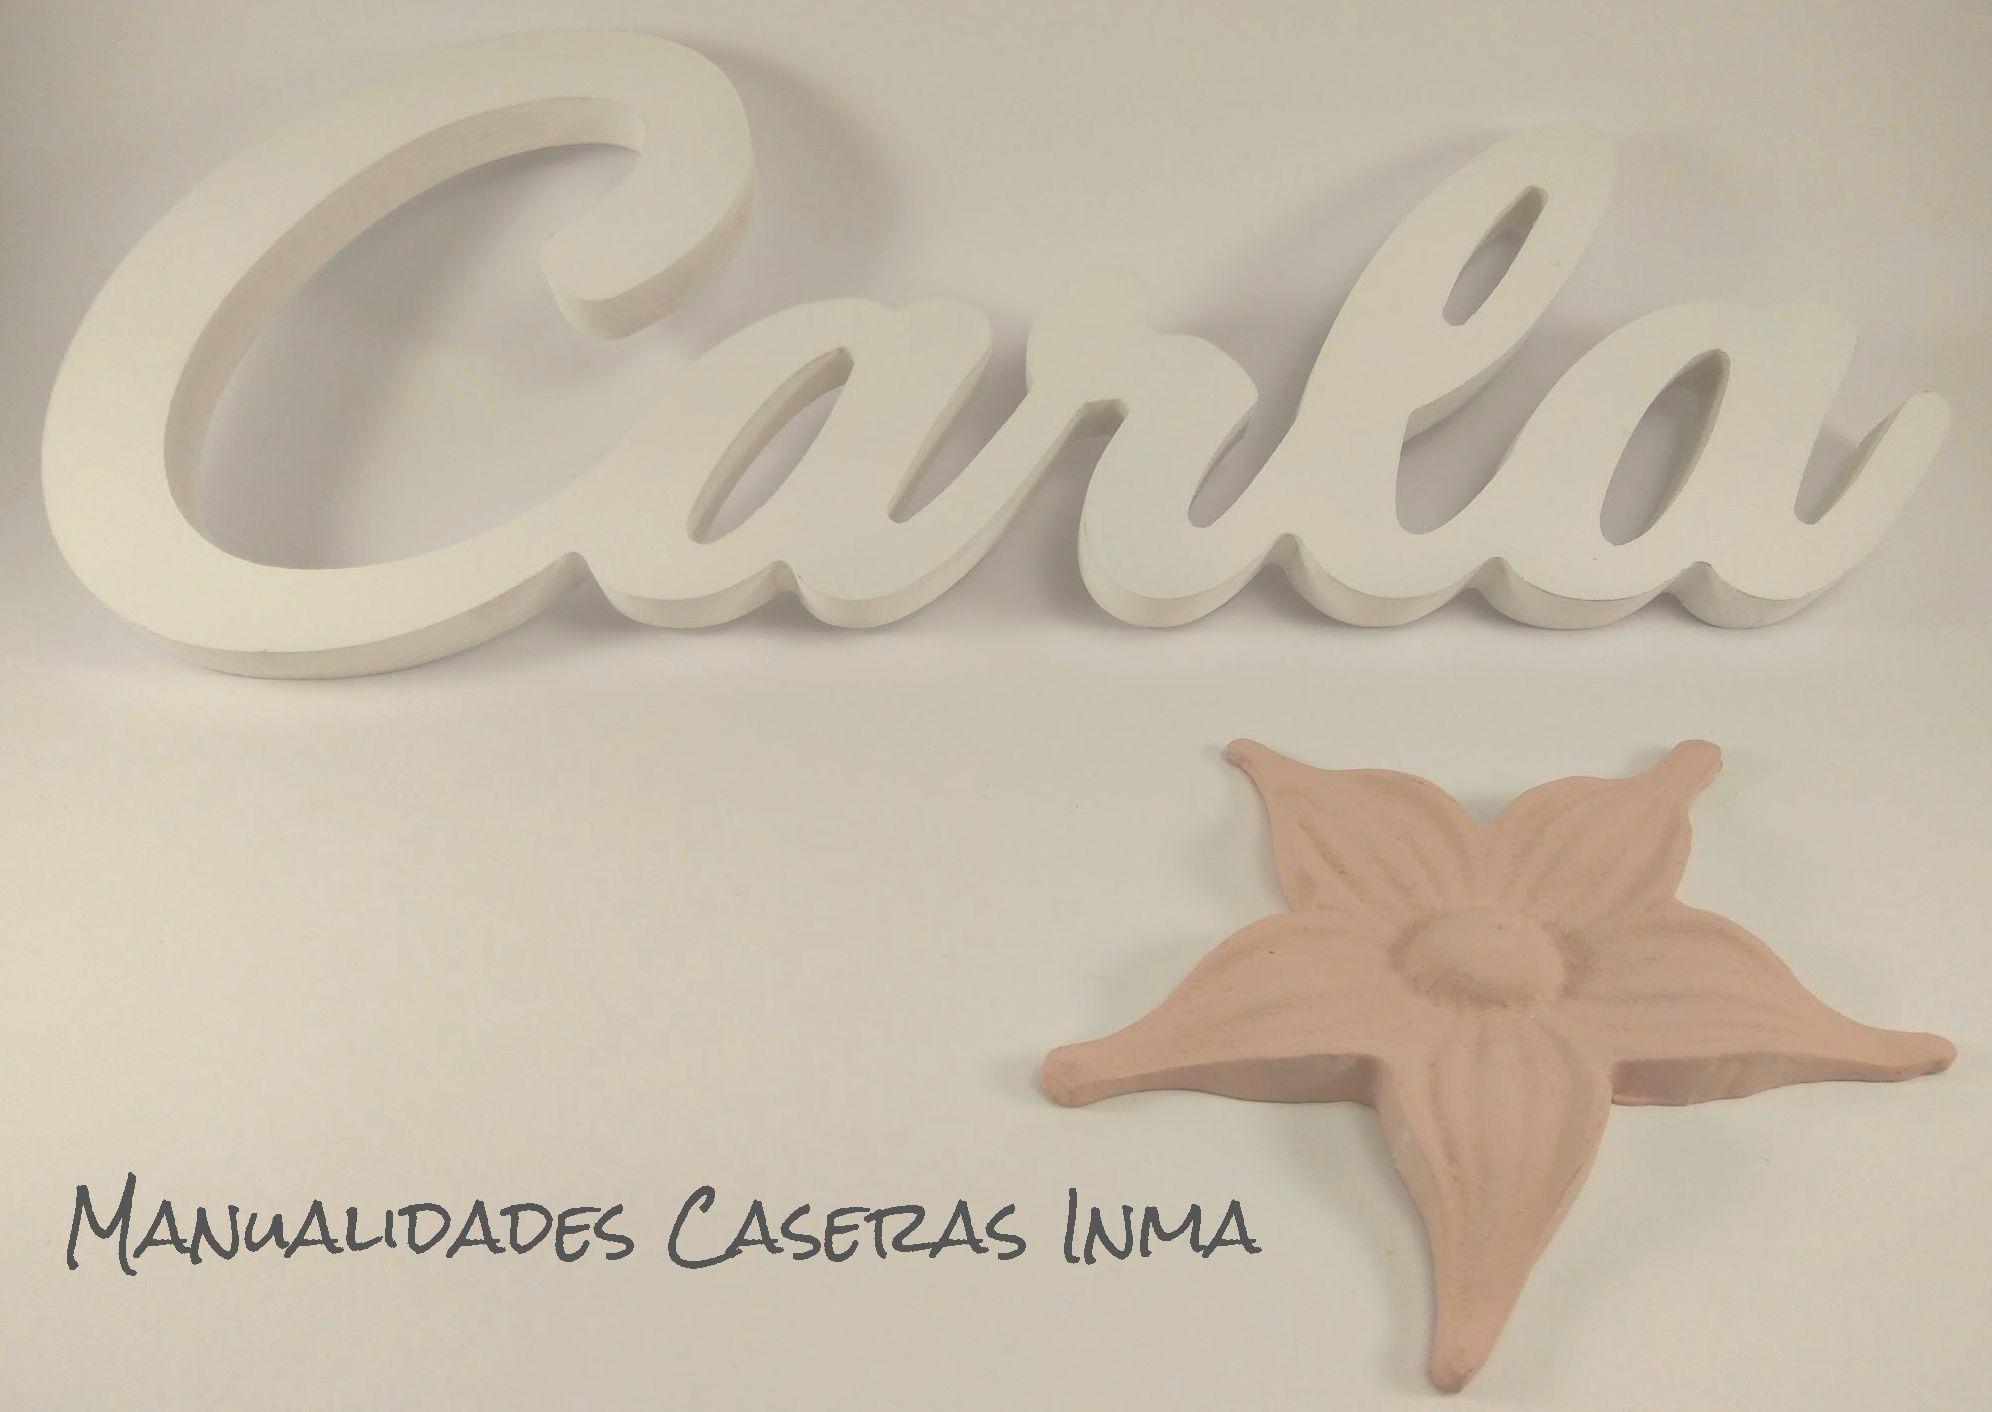 Manualidades Caseras Inma_ Nombres de madera Carla